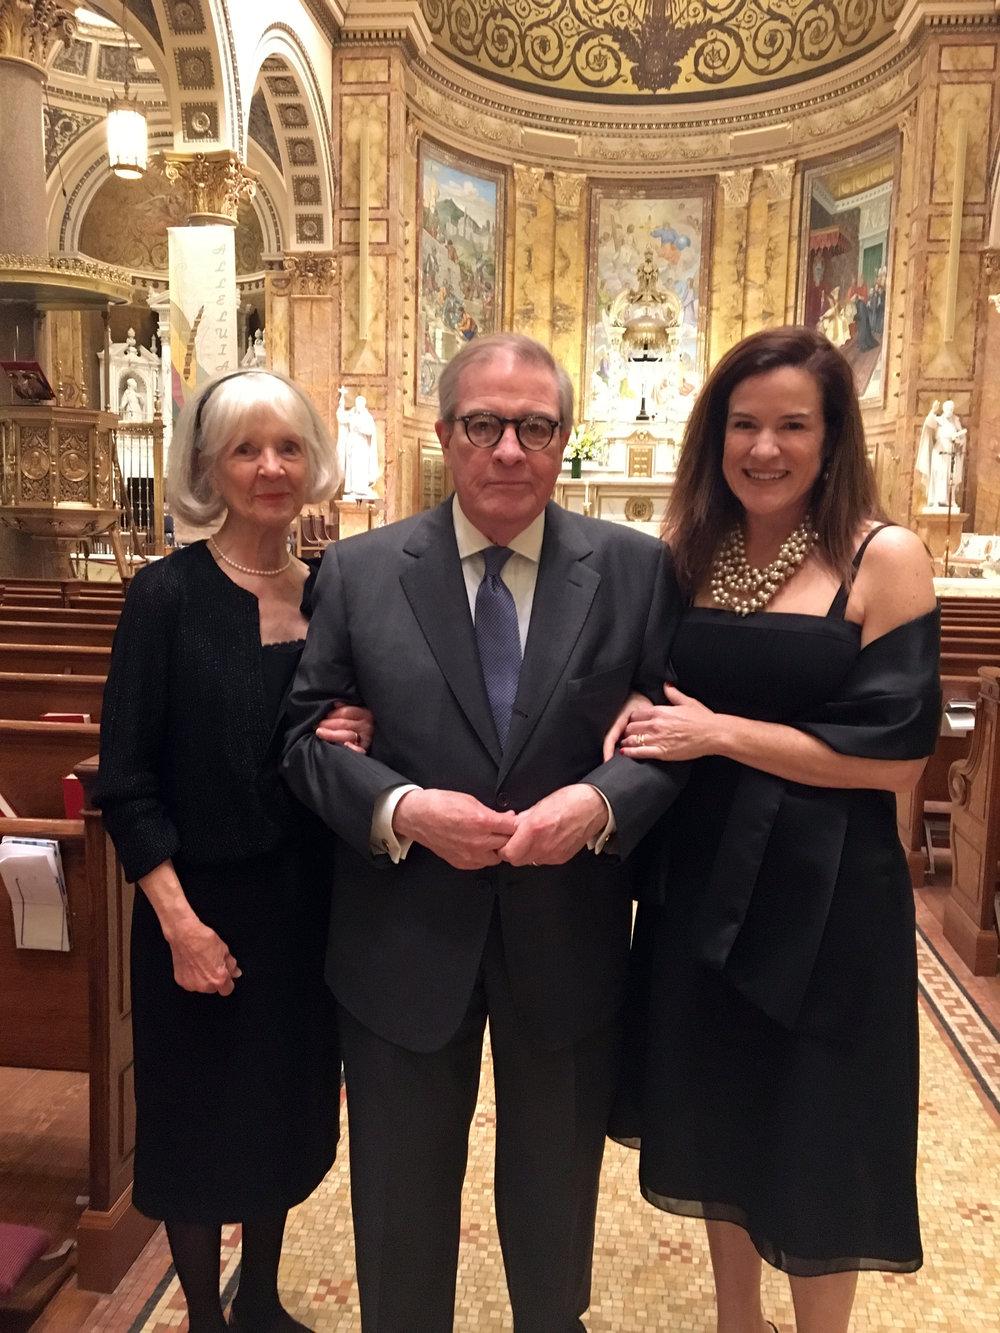 G.G & PAPA & LIZ:  St Ignatius Loyola Church, New York, NY